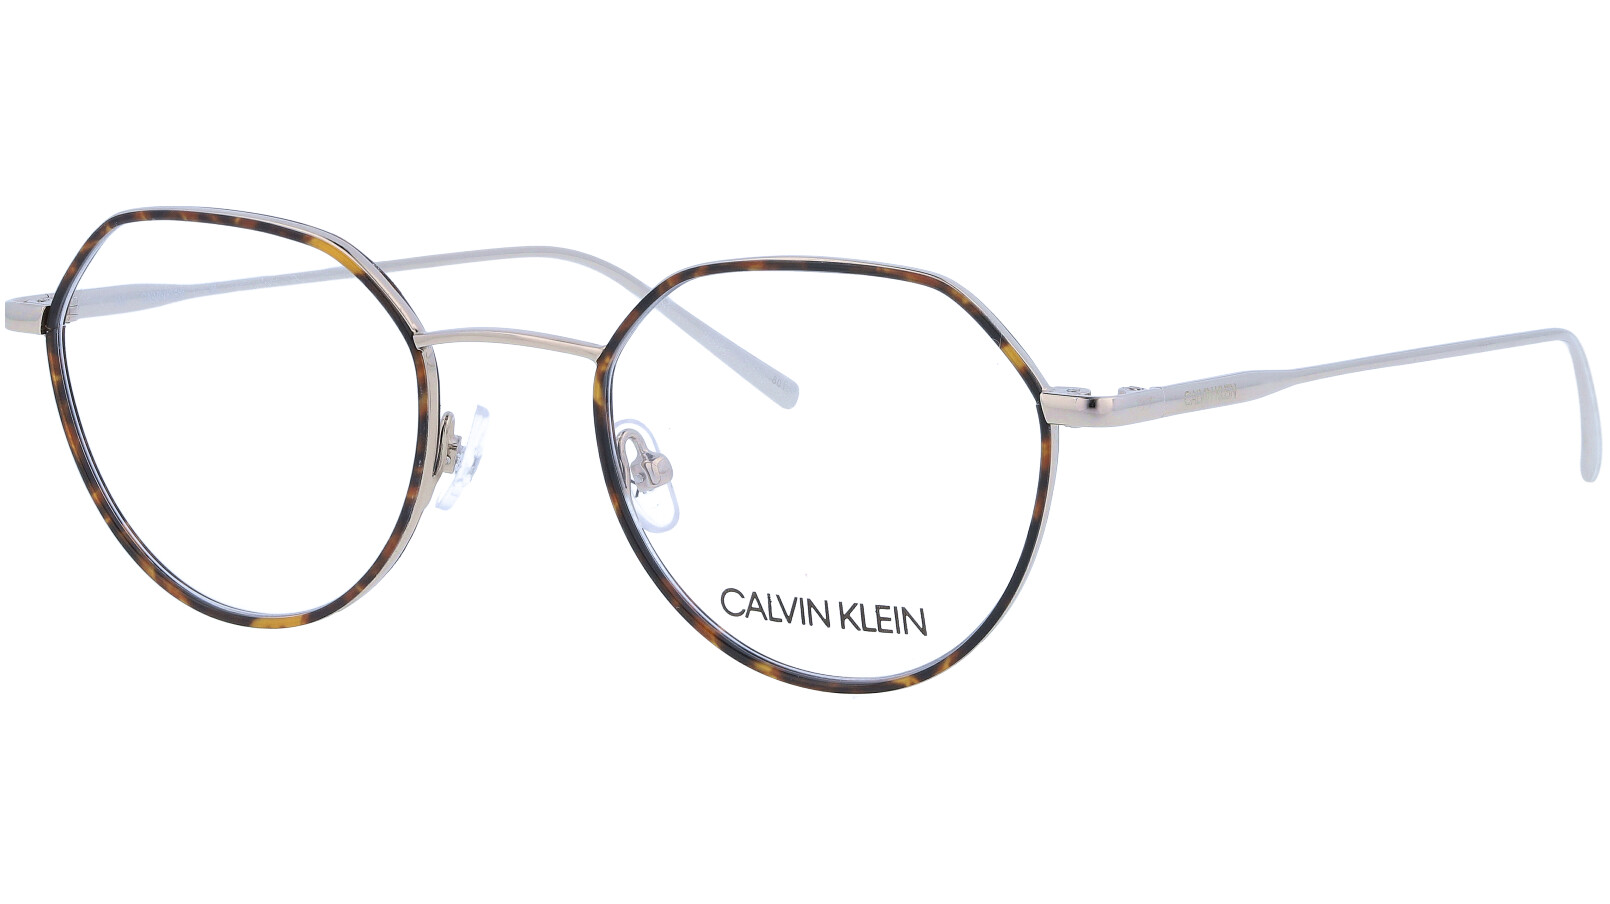 Calvin Klein CK5470 714 48  SilverY Glasses